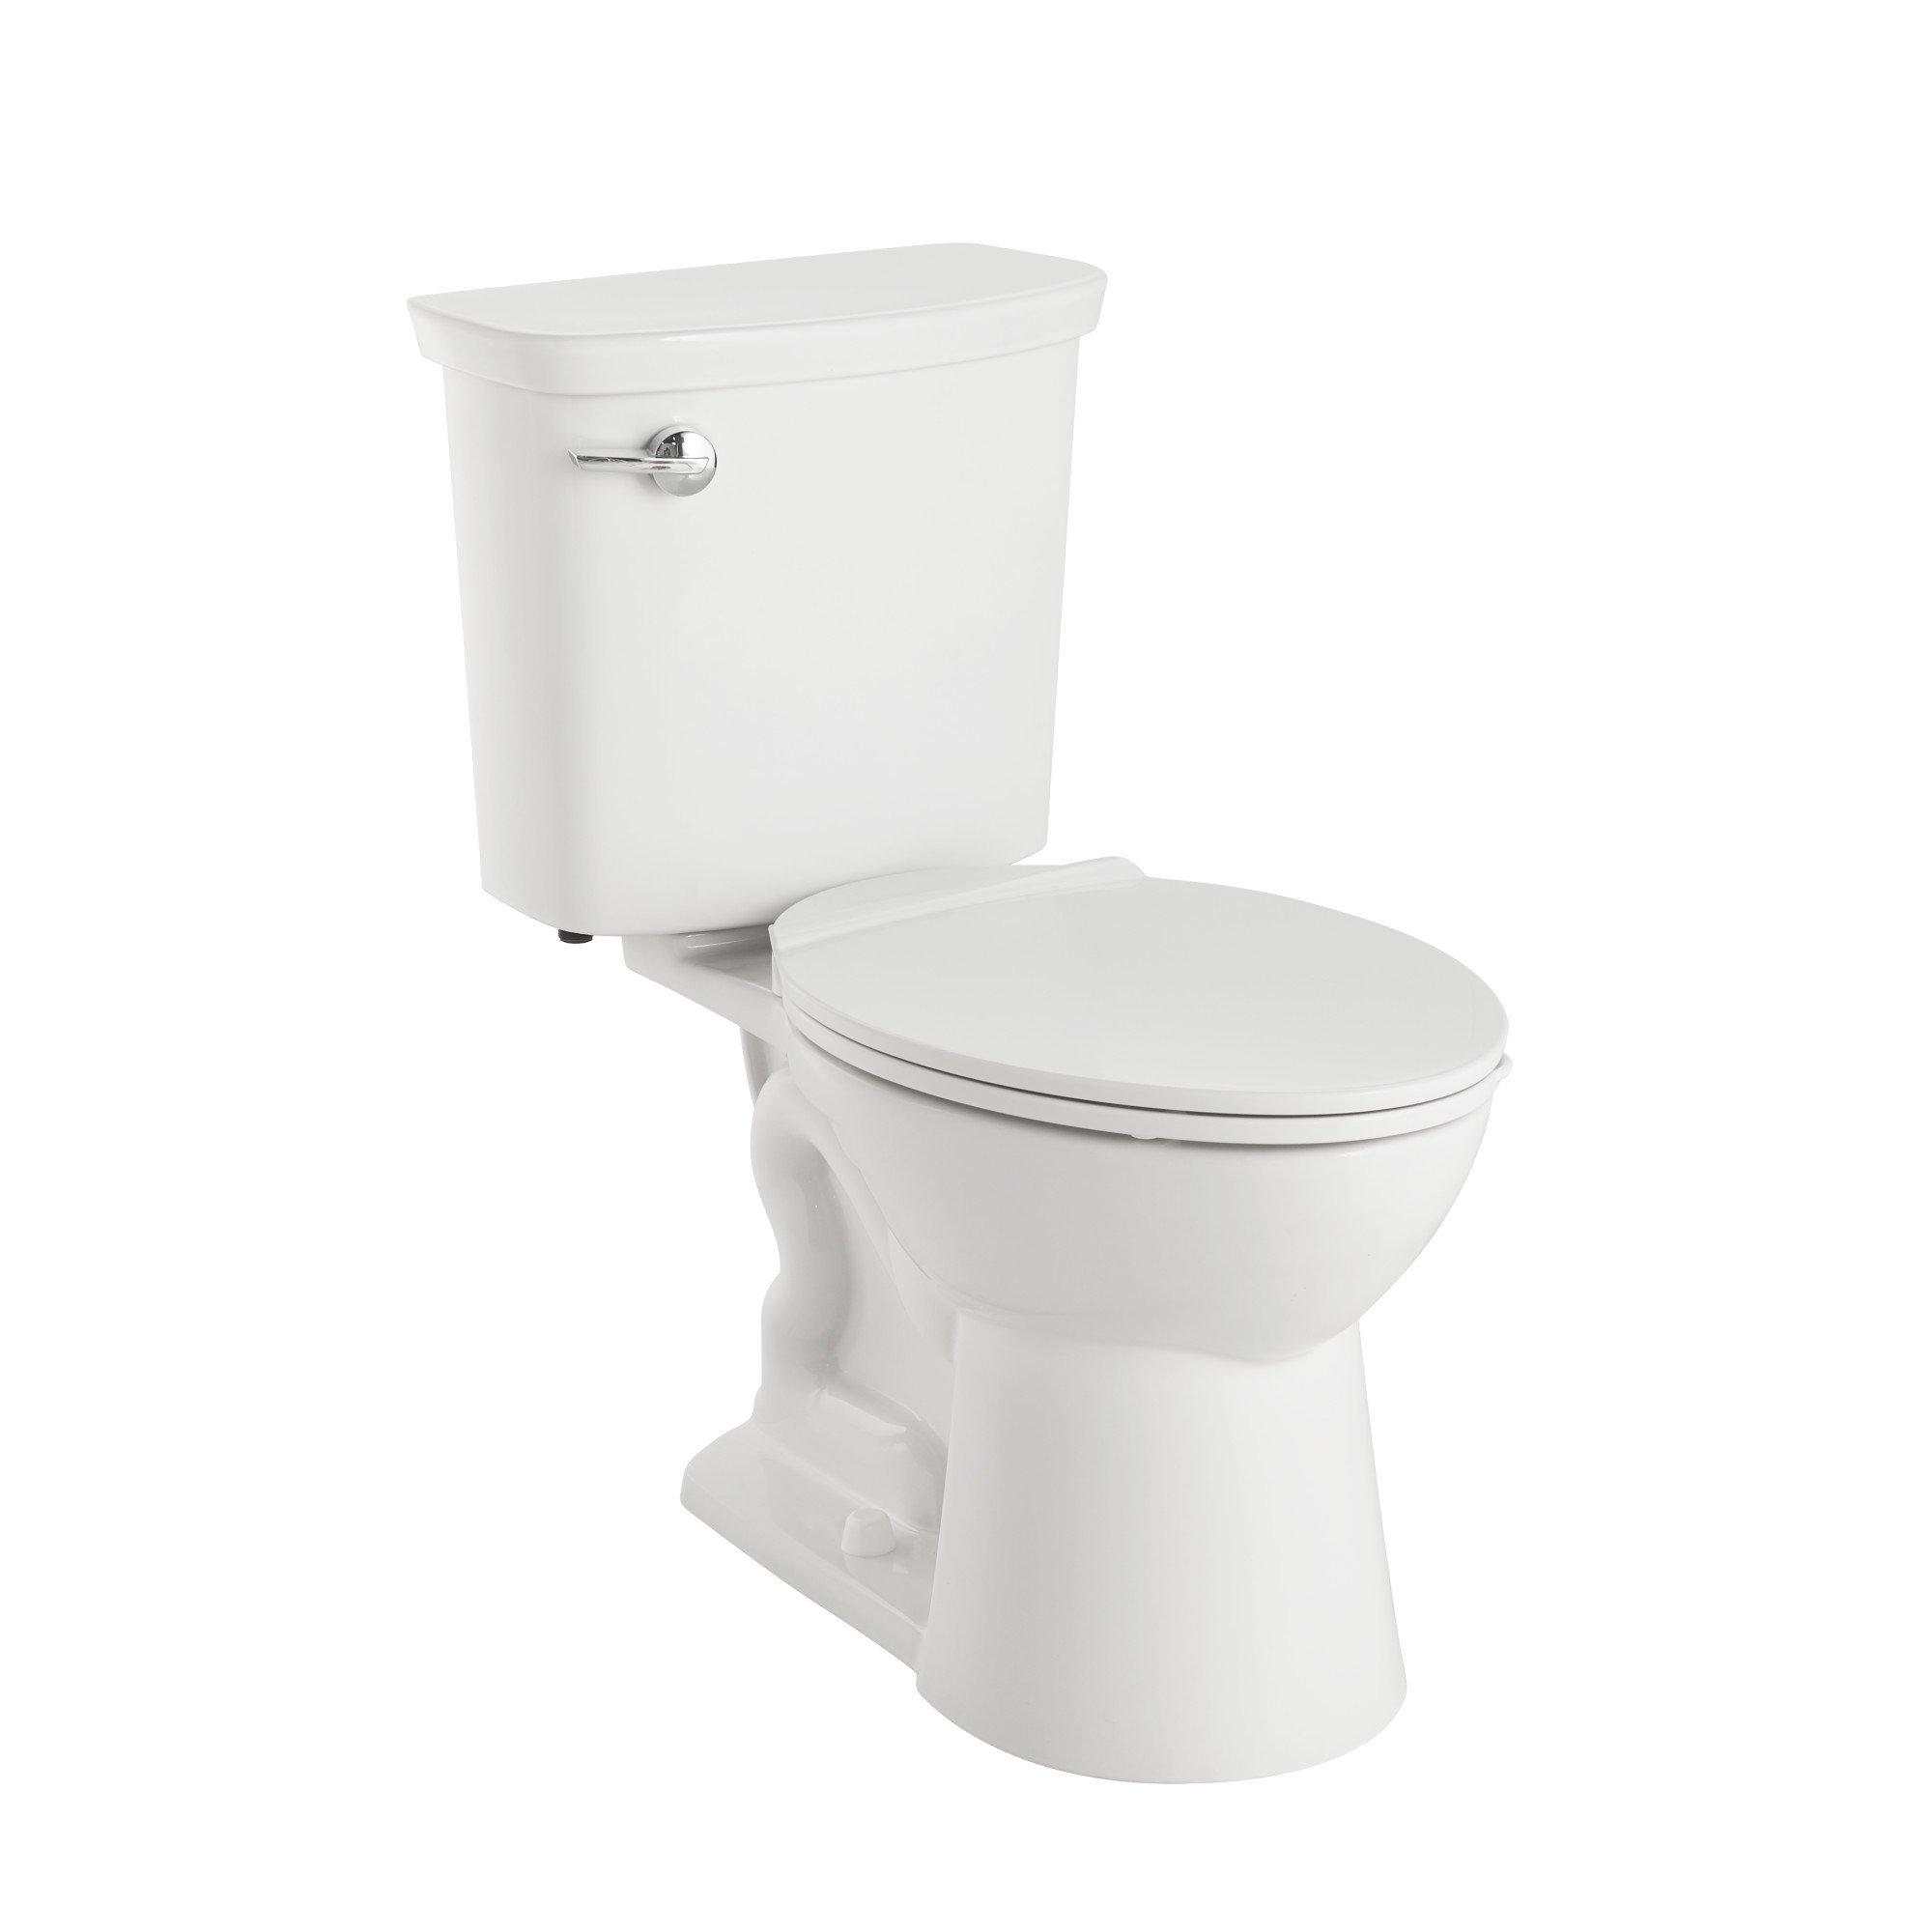 American Standard 238AA114CP.020 Vormax Plus Uhet Combo W/Seat-Wht, White